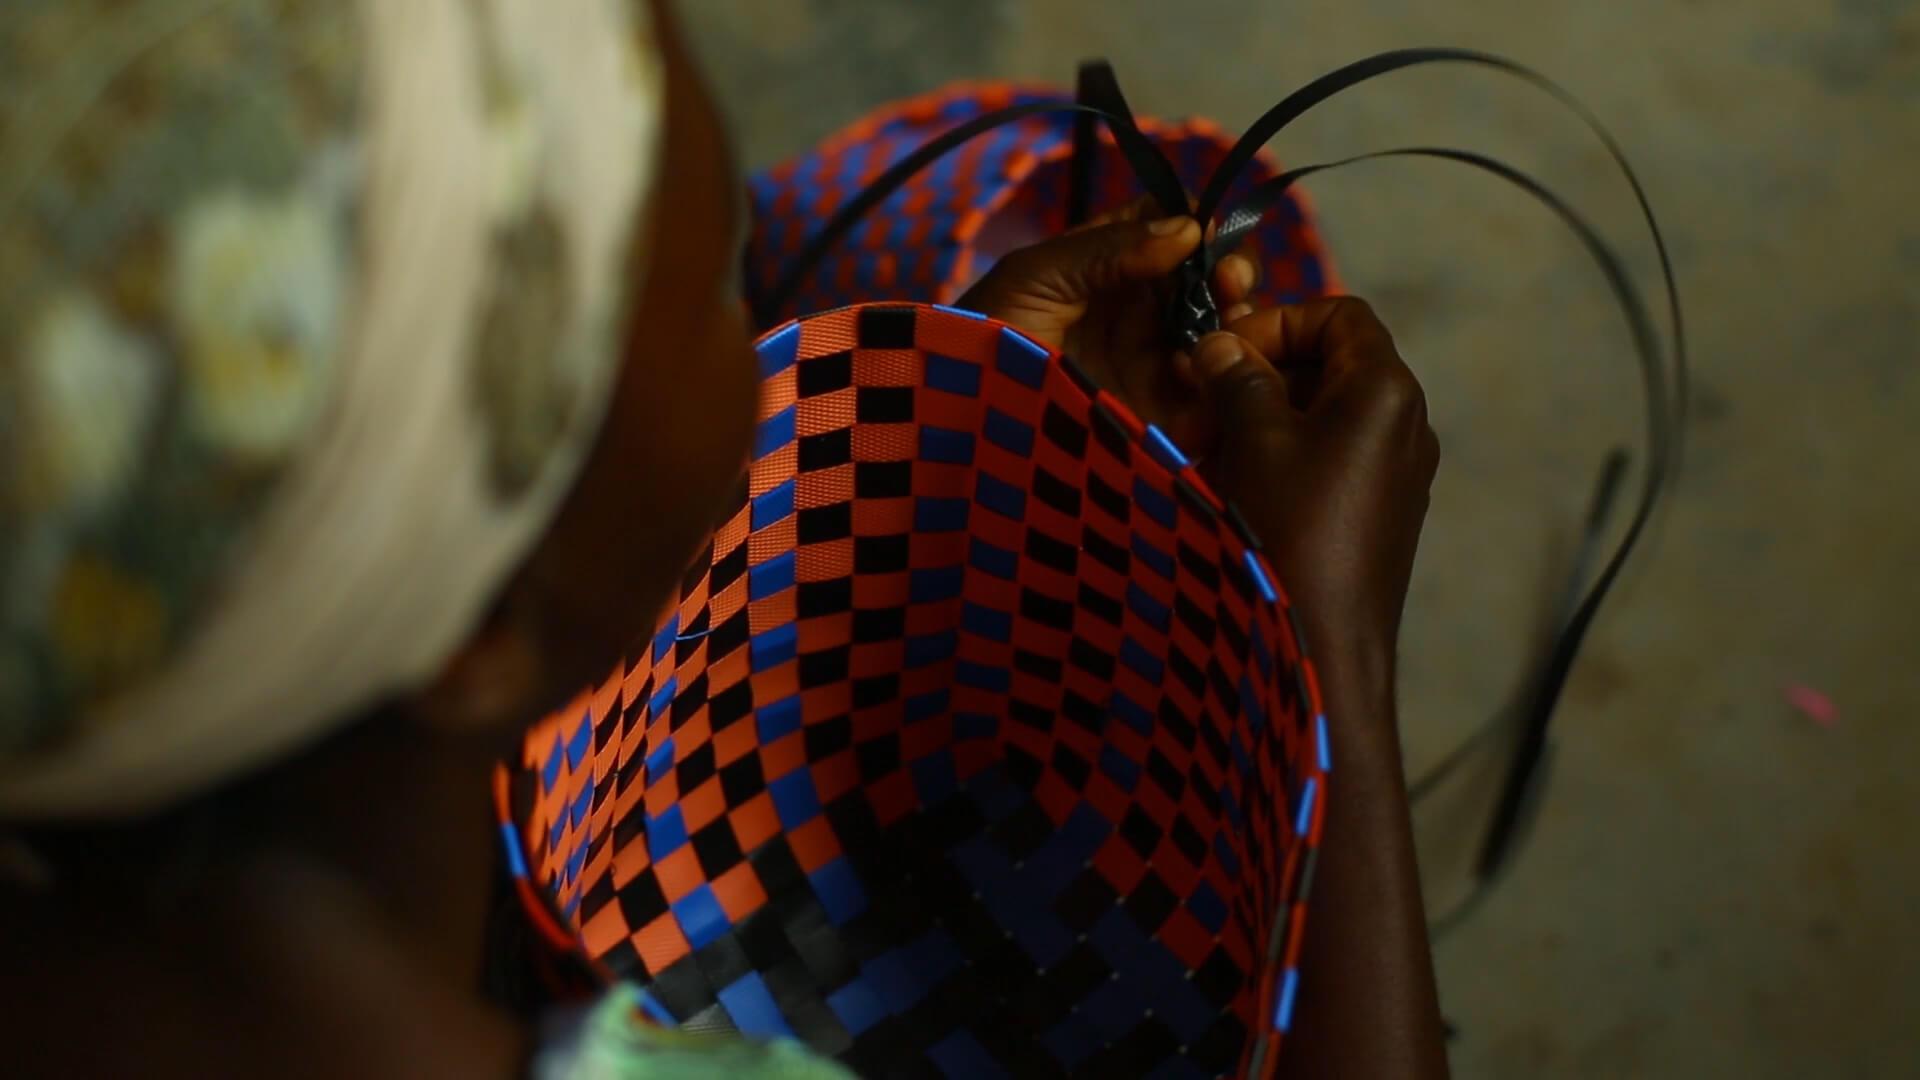 Woman hand weaving basked